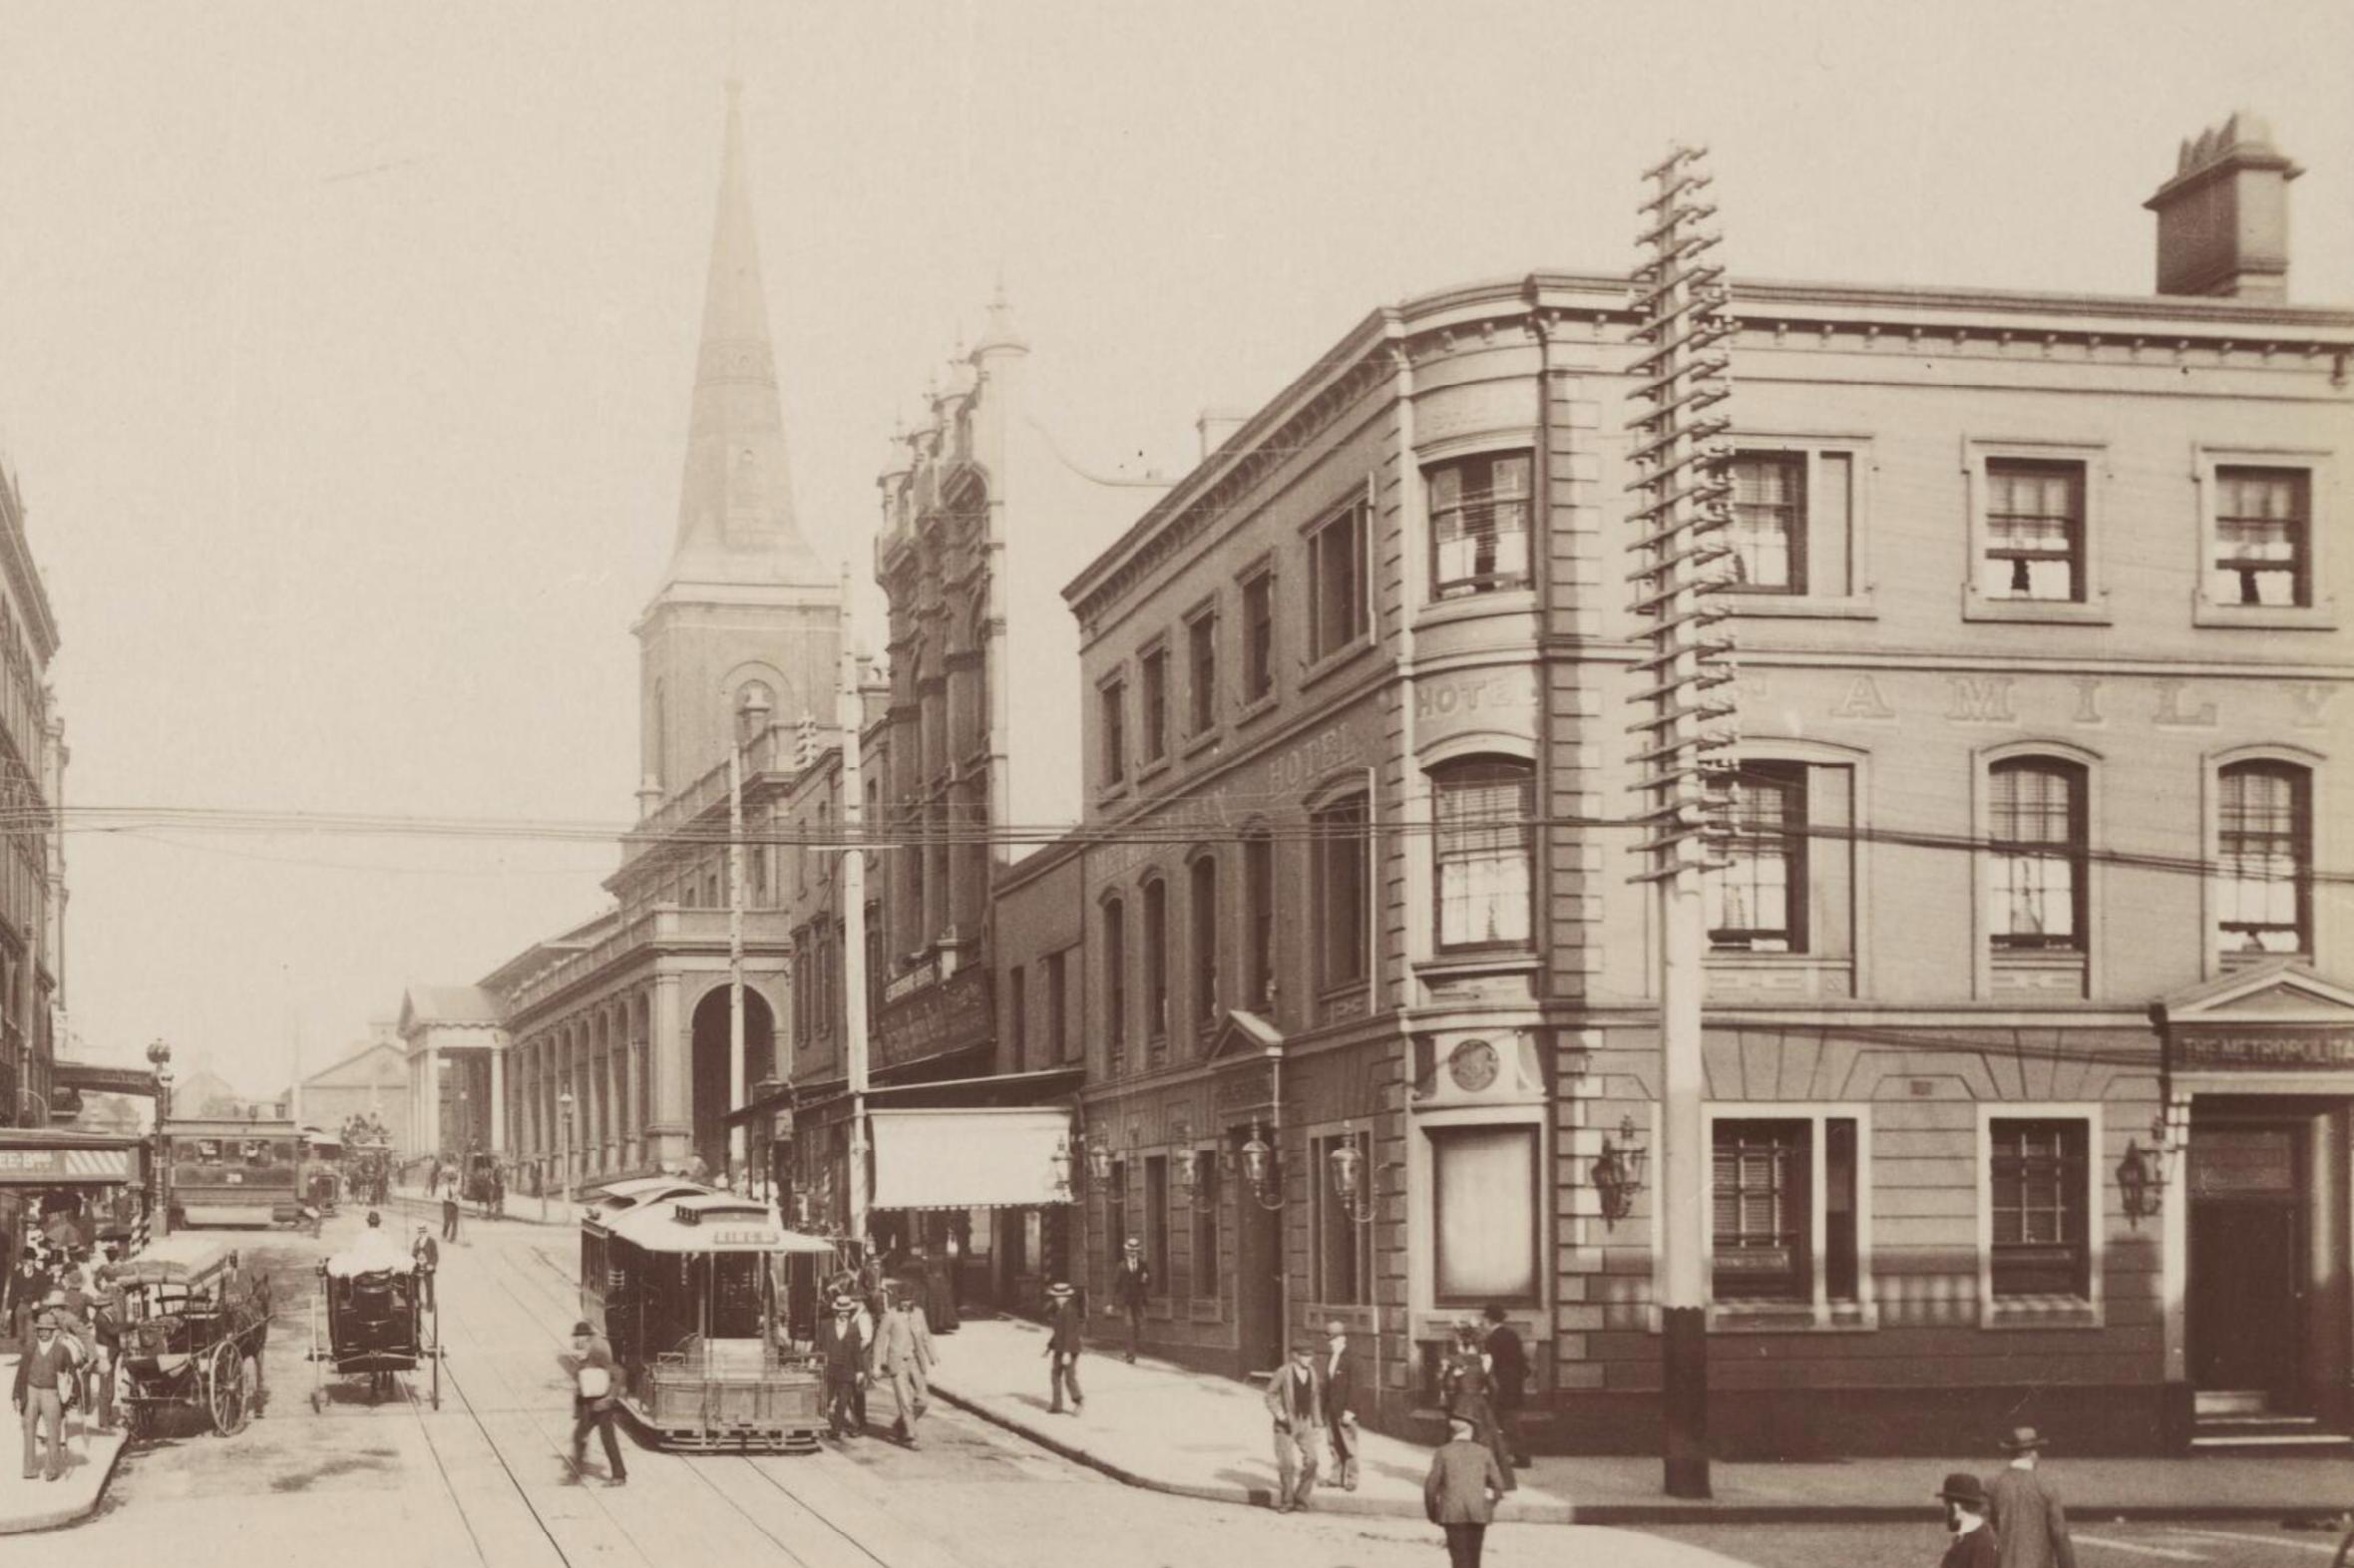 Metropolitan Hotel, corner of King and Castlereagh Streets, Sydney, c.1895